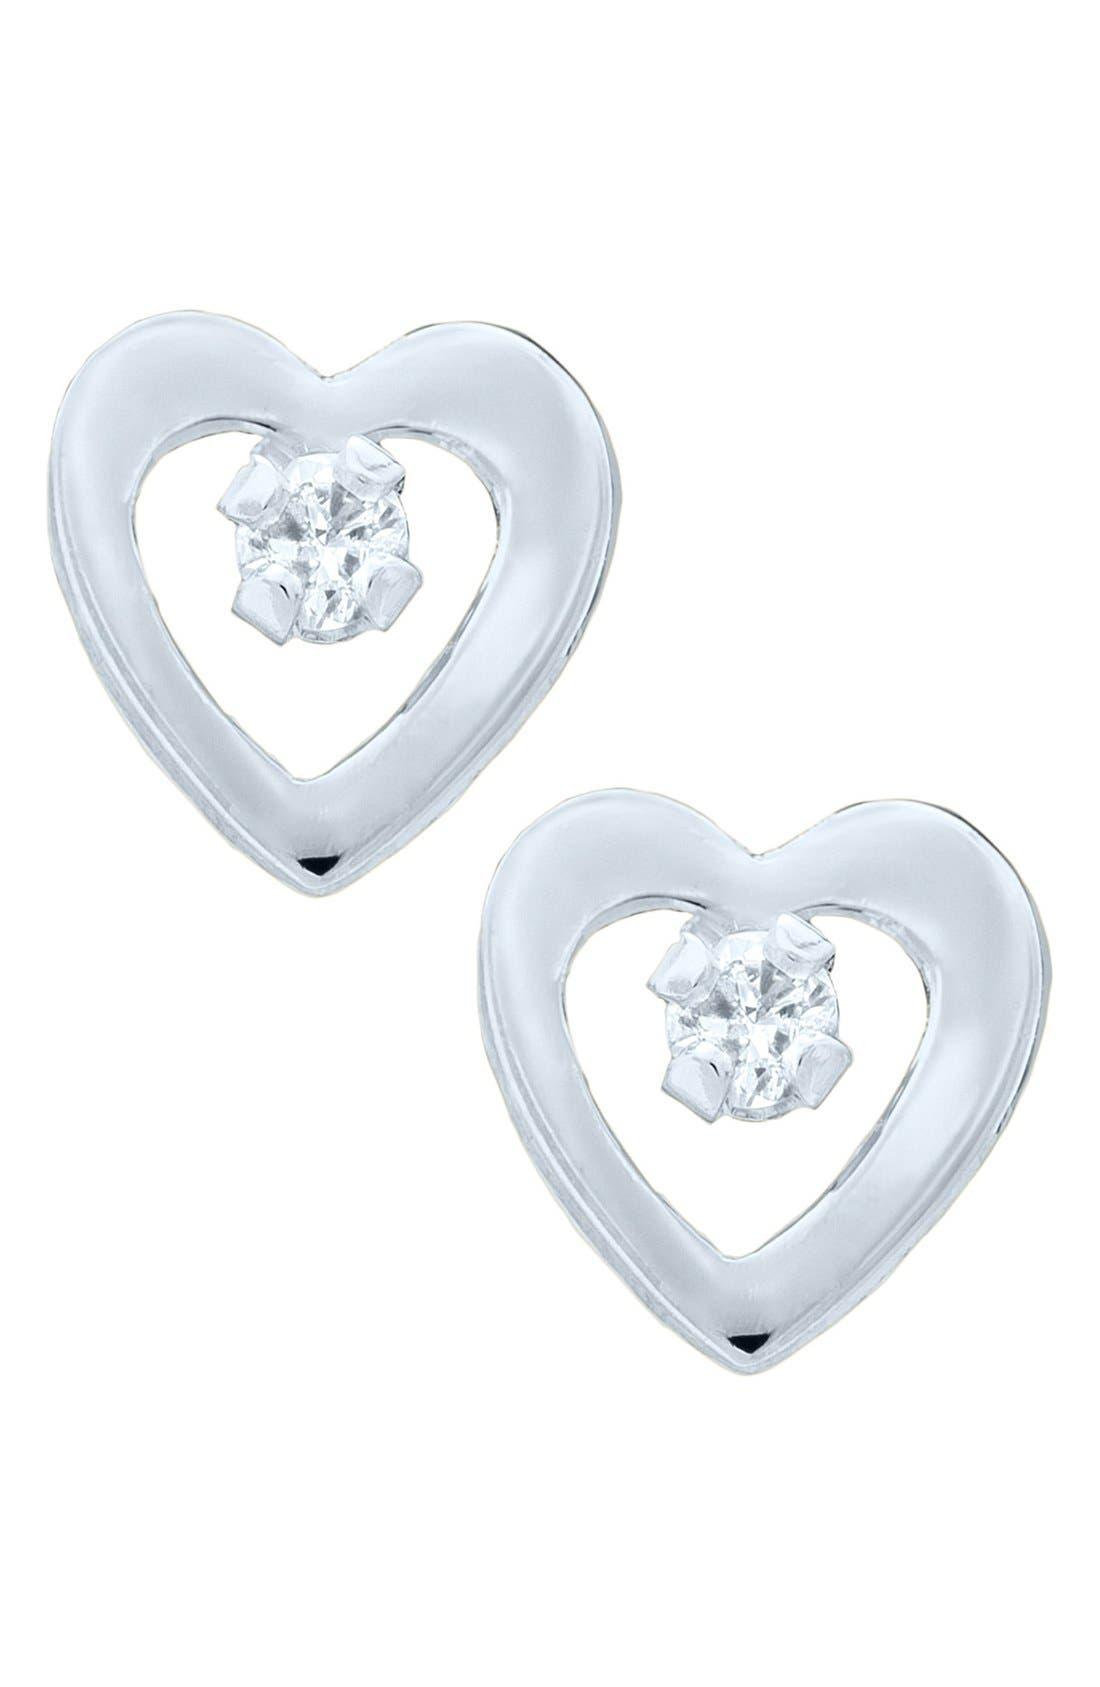 14k White Gold & Diamond Heart Earrings,                         Main,                         color, Silver